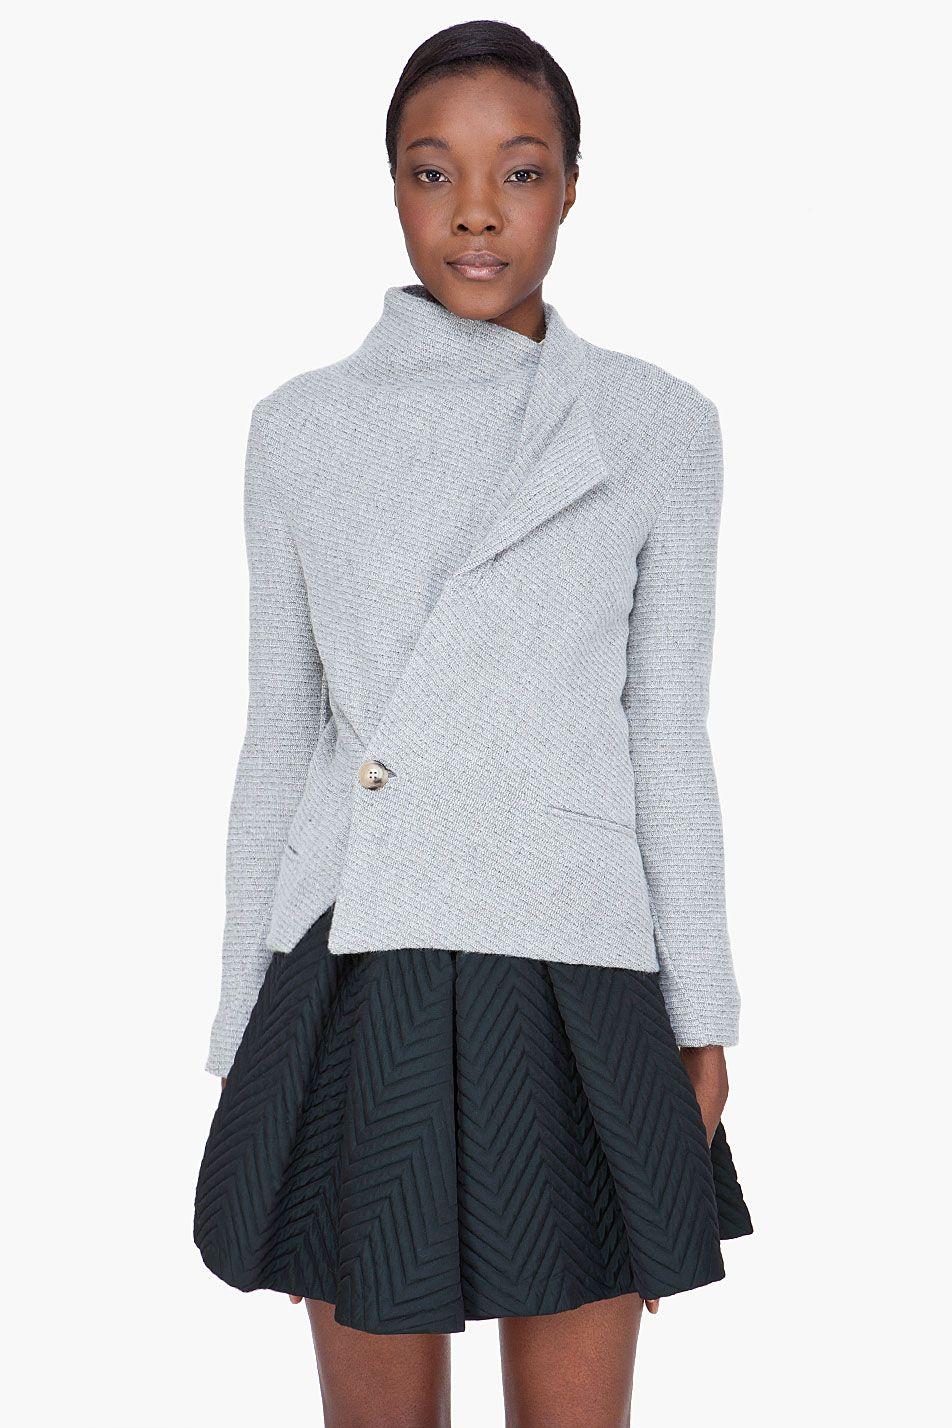 SEE BY CHLOE heather gray wool Wrap Jacket